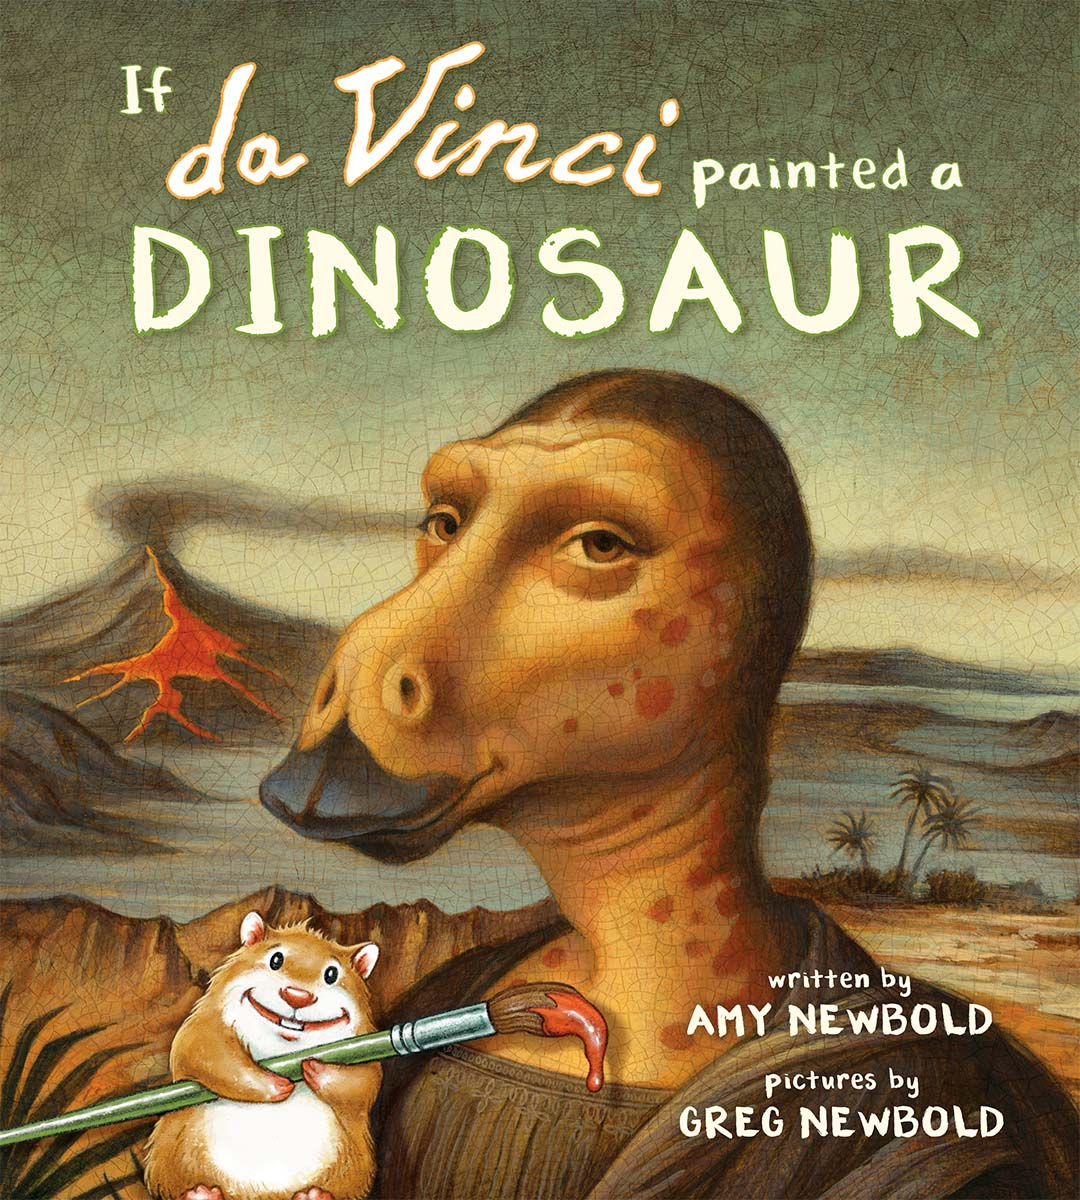 If Da Vinci Painted a Dinosaur by author Amy Newbold